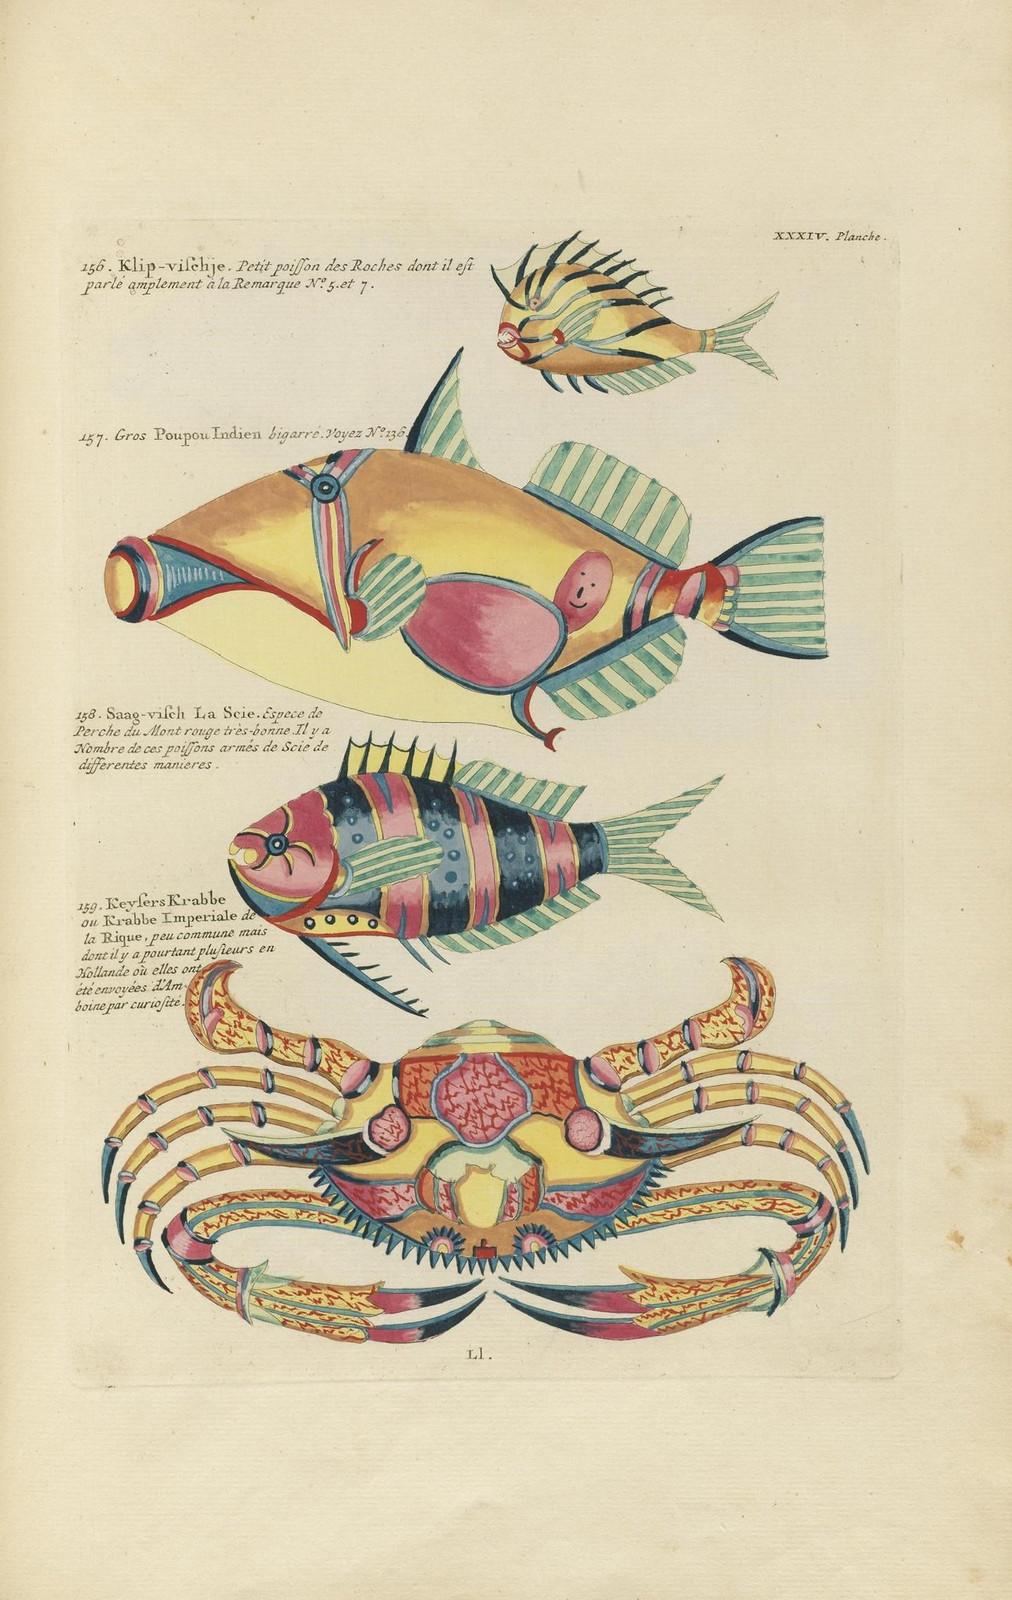 Louis Renard poissons 17